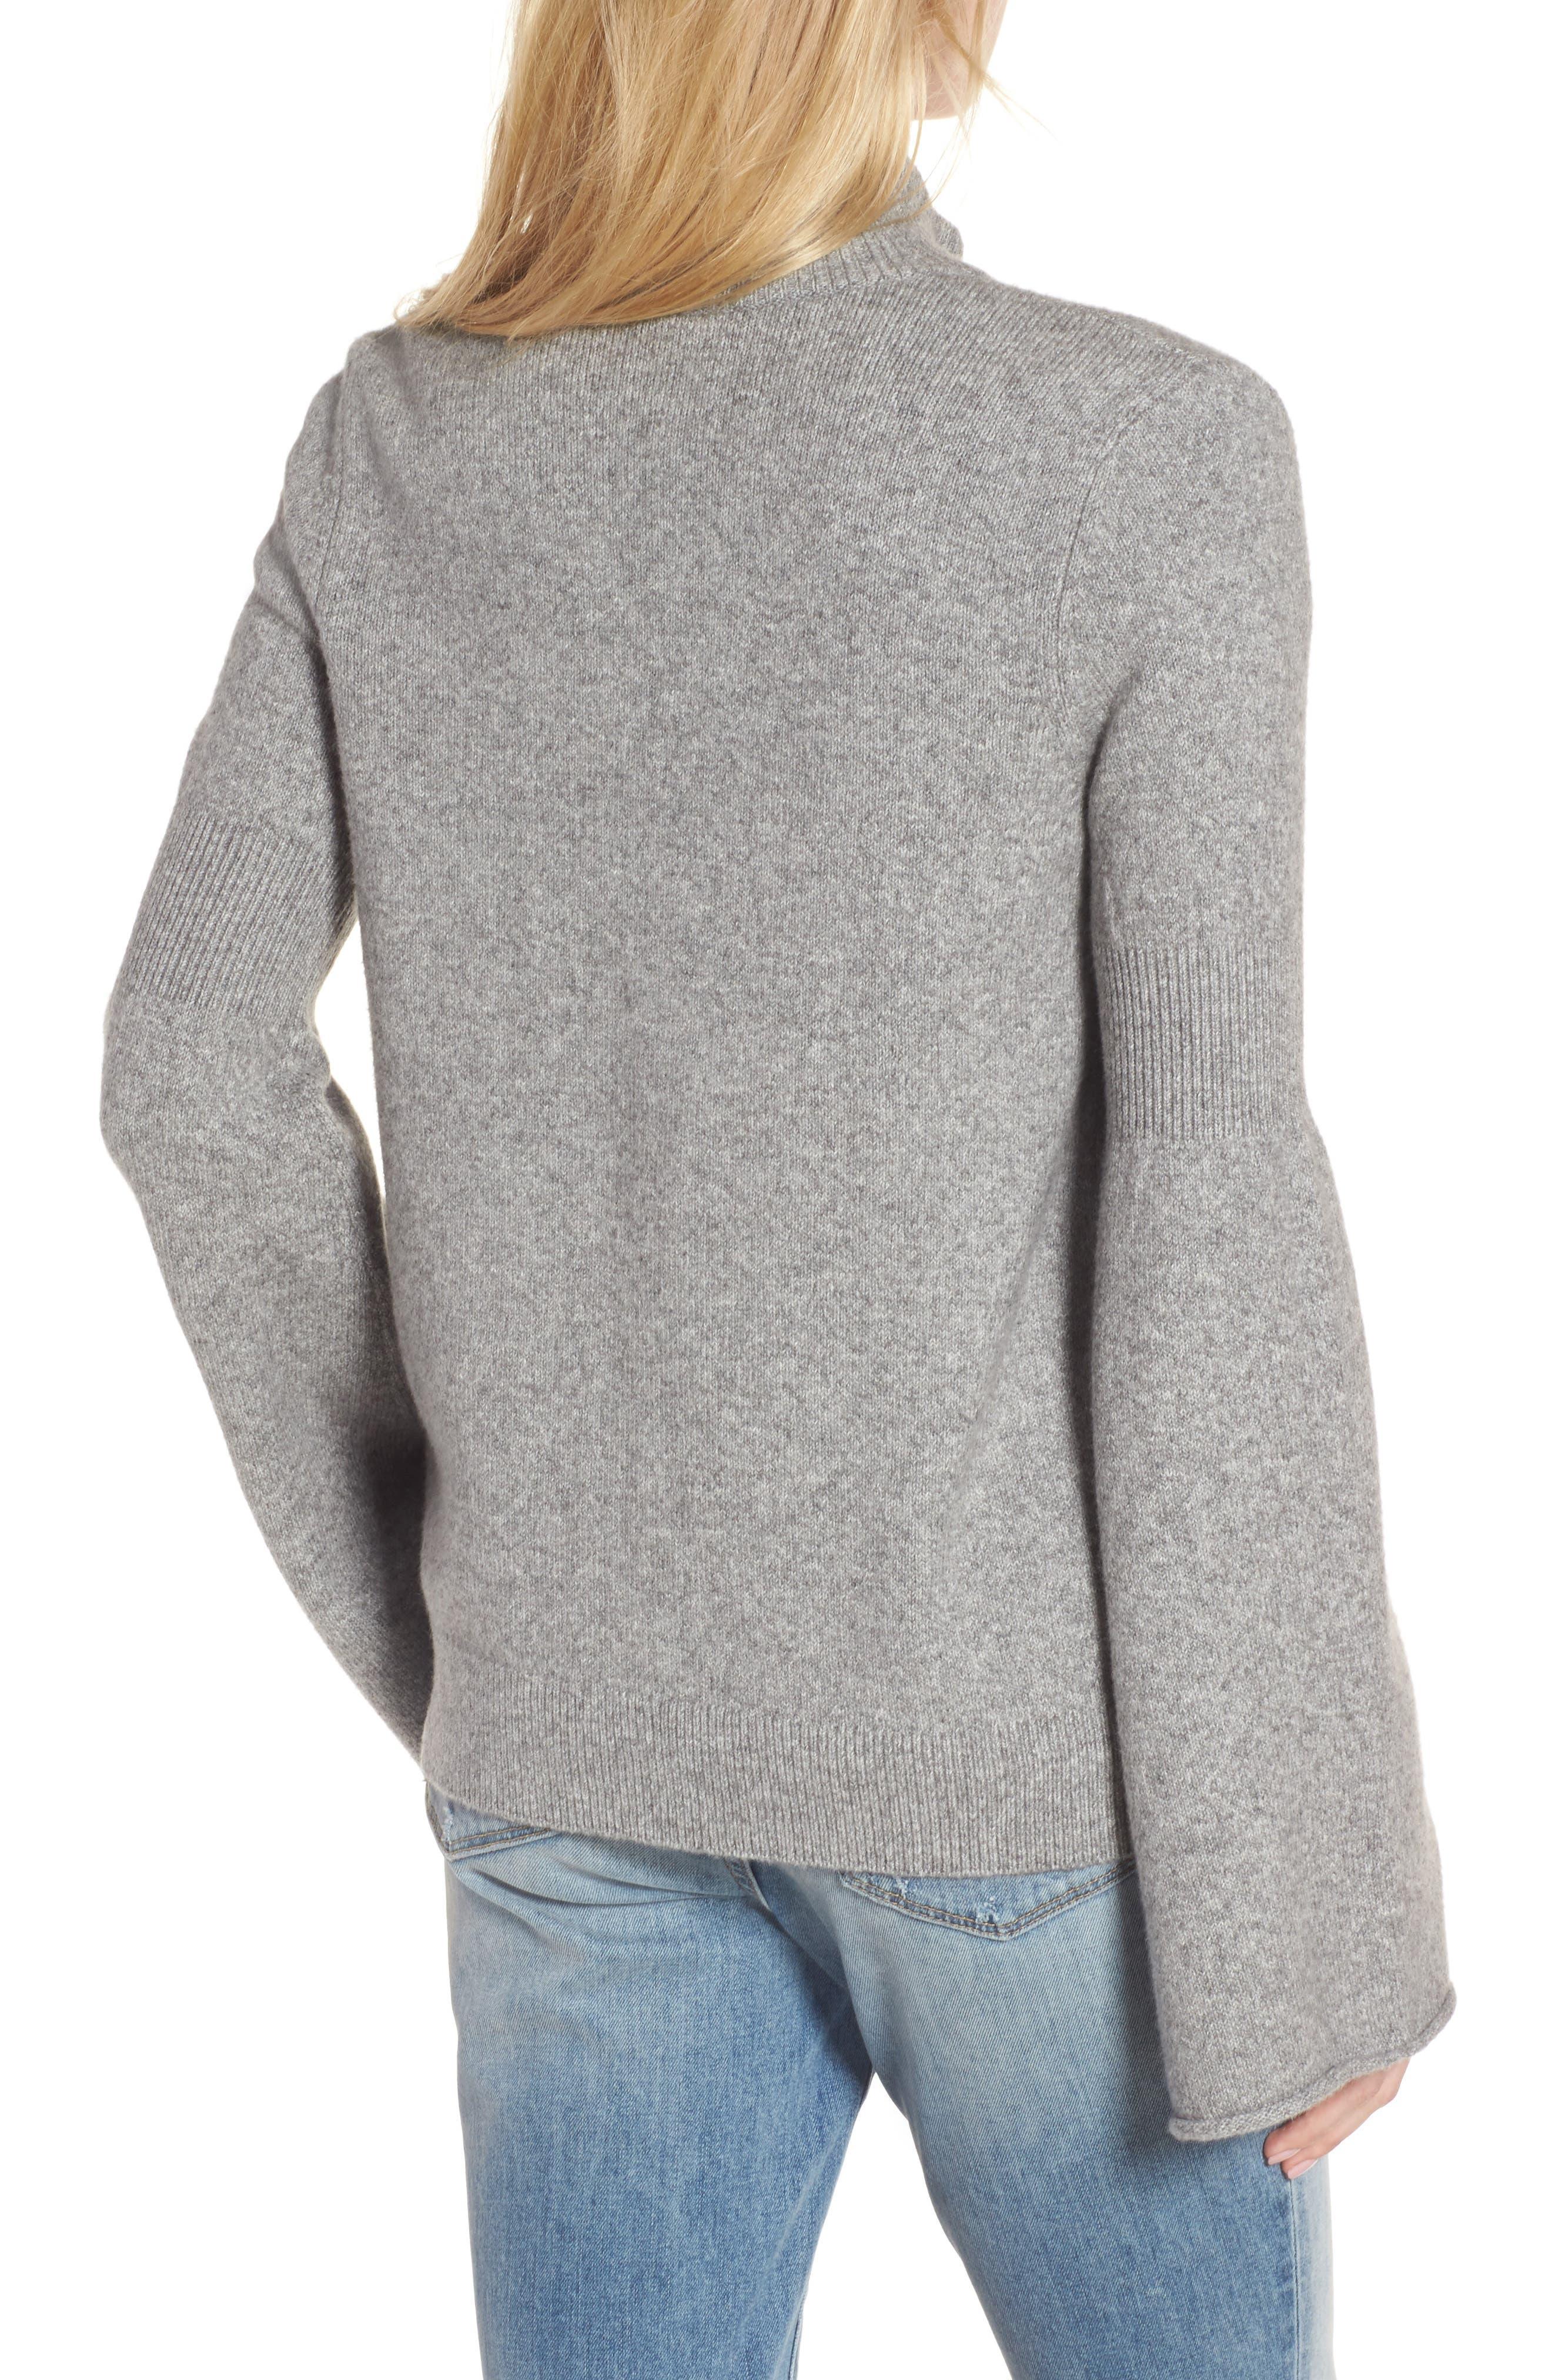 Flare Sleeve Track Jacket,                             Alternate thumbnail 2, color,                             Grey Heather